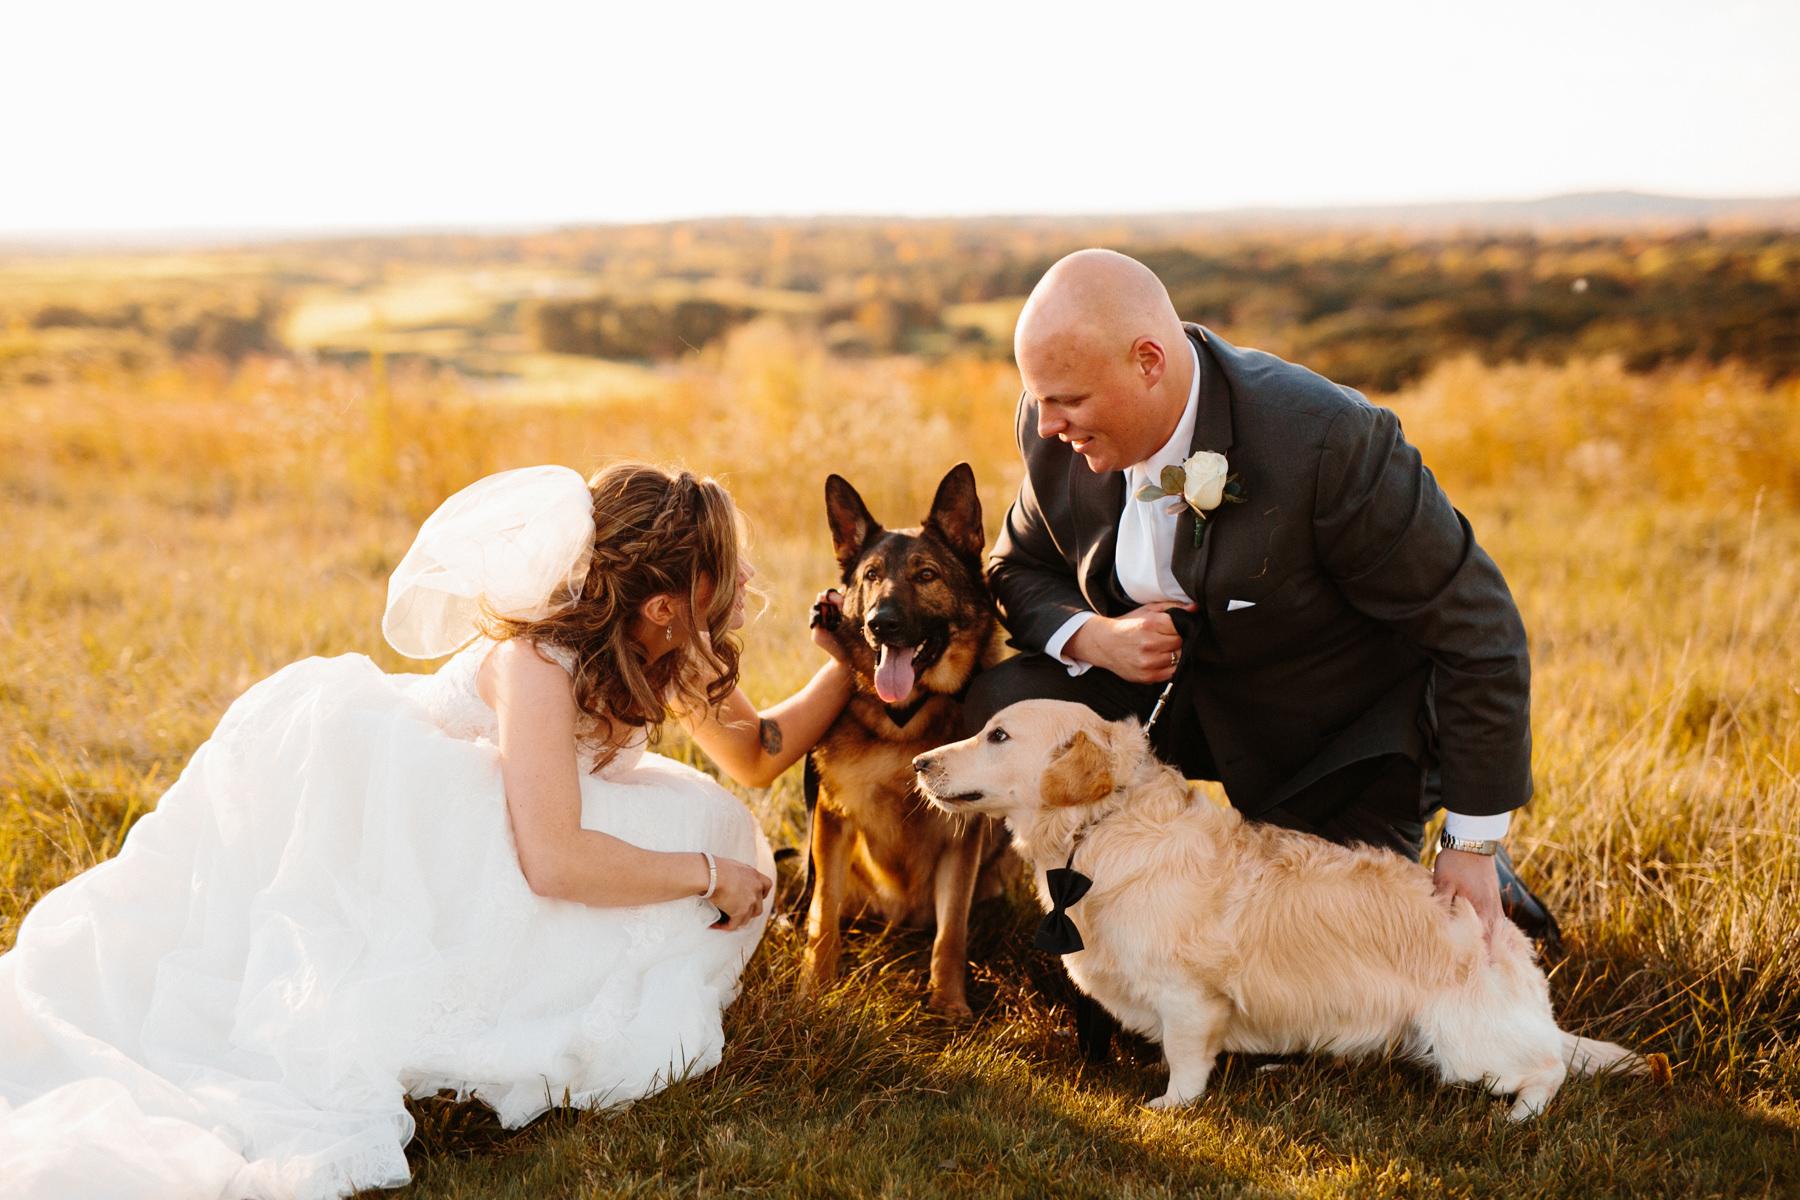 Quincy Ma Massachusetts Wedding Dedham Boston Granie Links Wedding New England Catholic Cathedral Liz Osban Photography 57.jpg